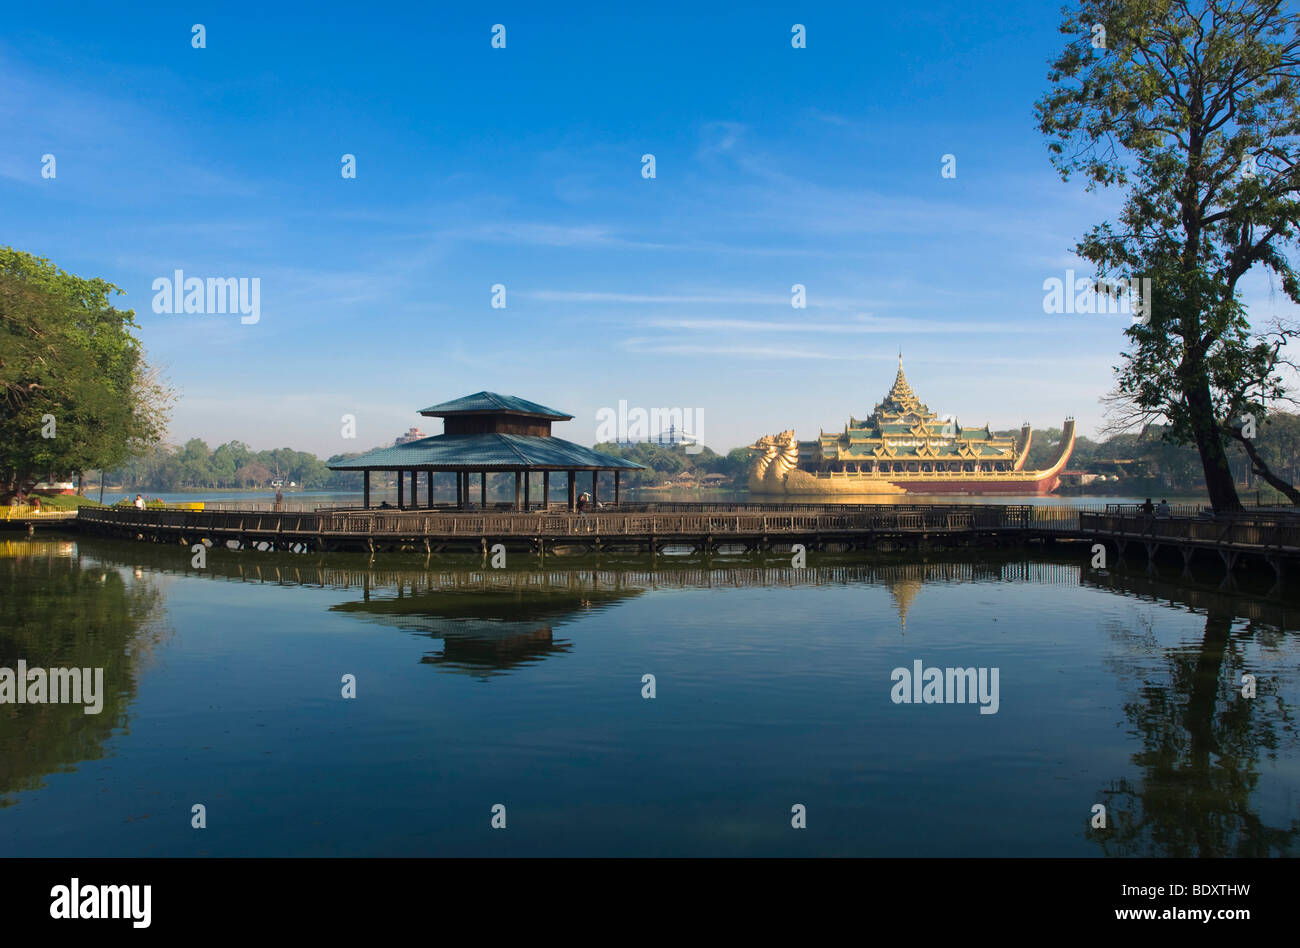 Karaweik restaurant, dragon boat, Kandawgyi Lake, Rangoon, Yangon, Burma, Myanmar, Asia Stock Photo